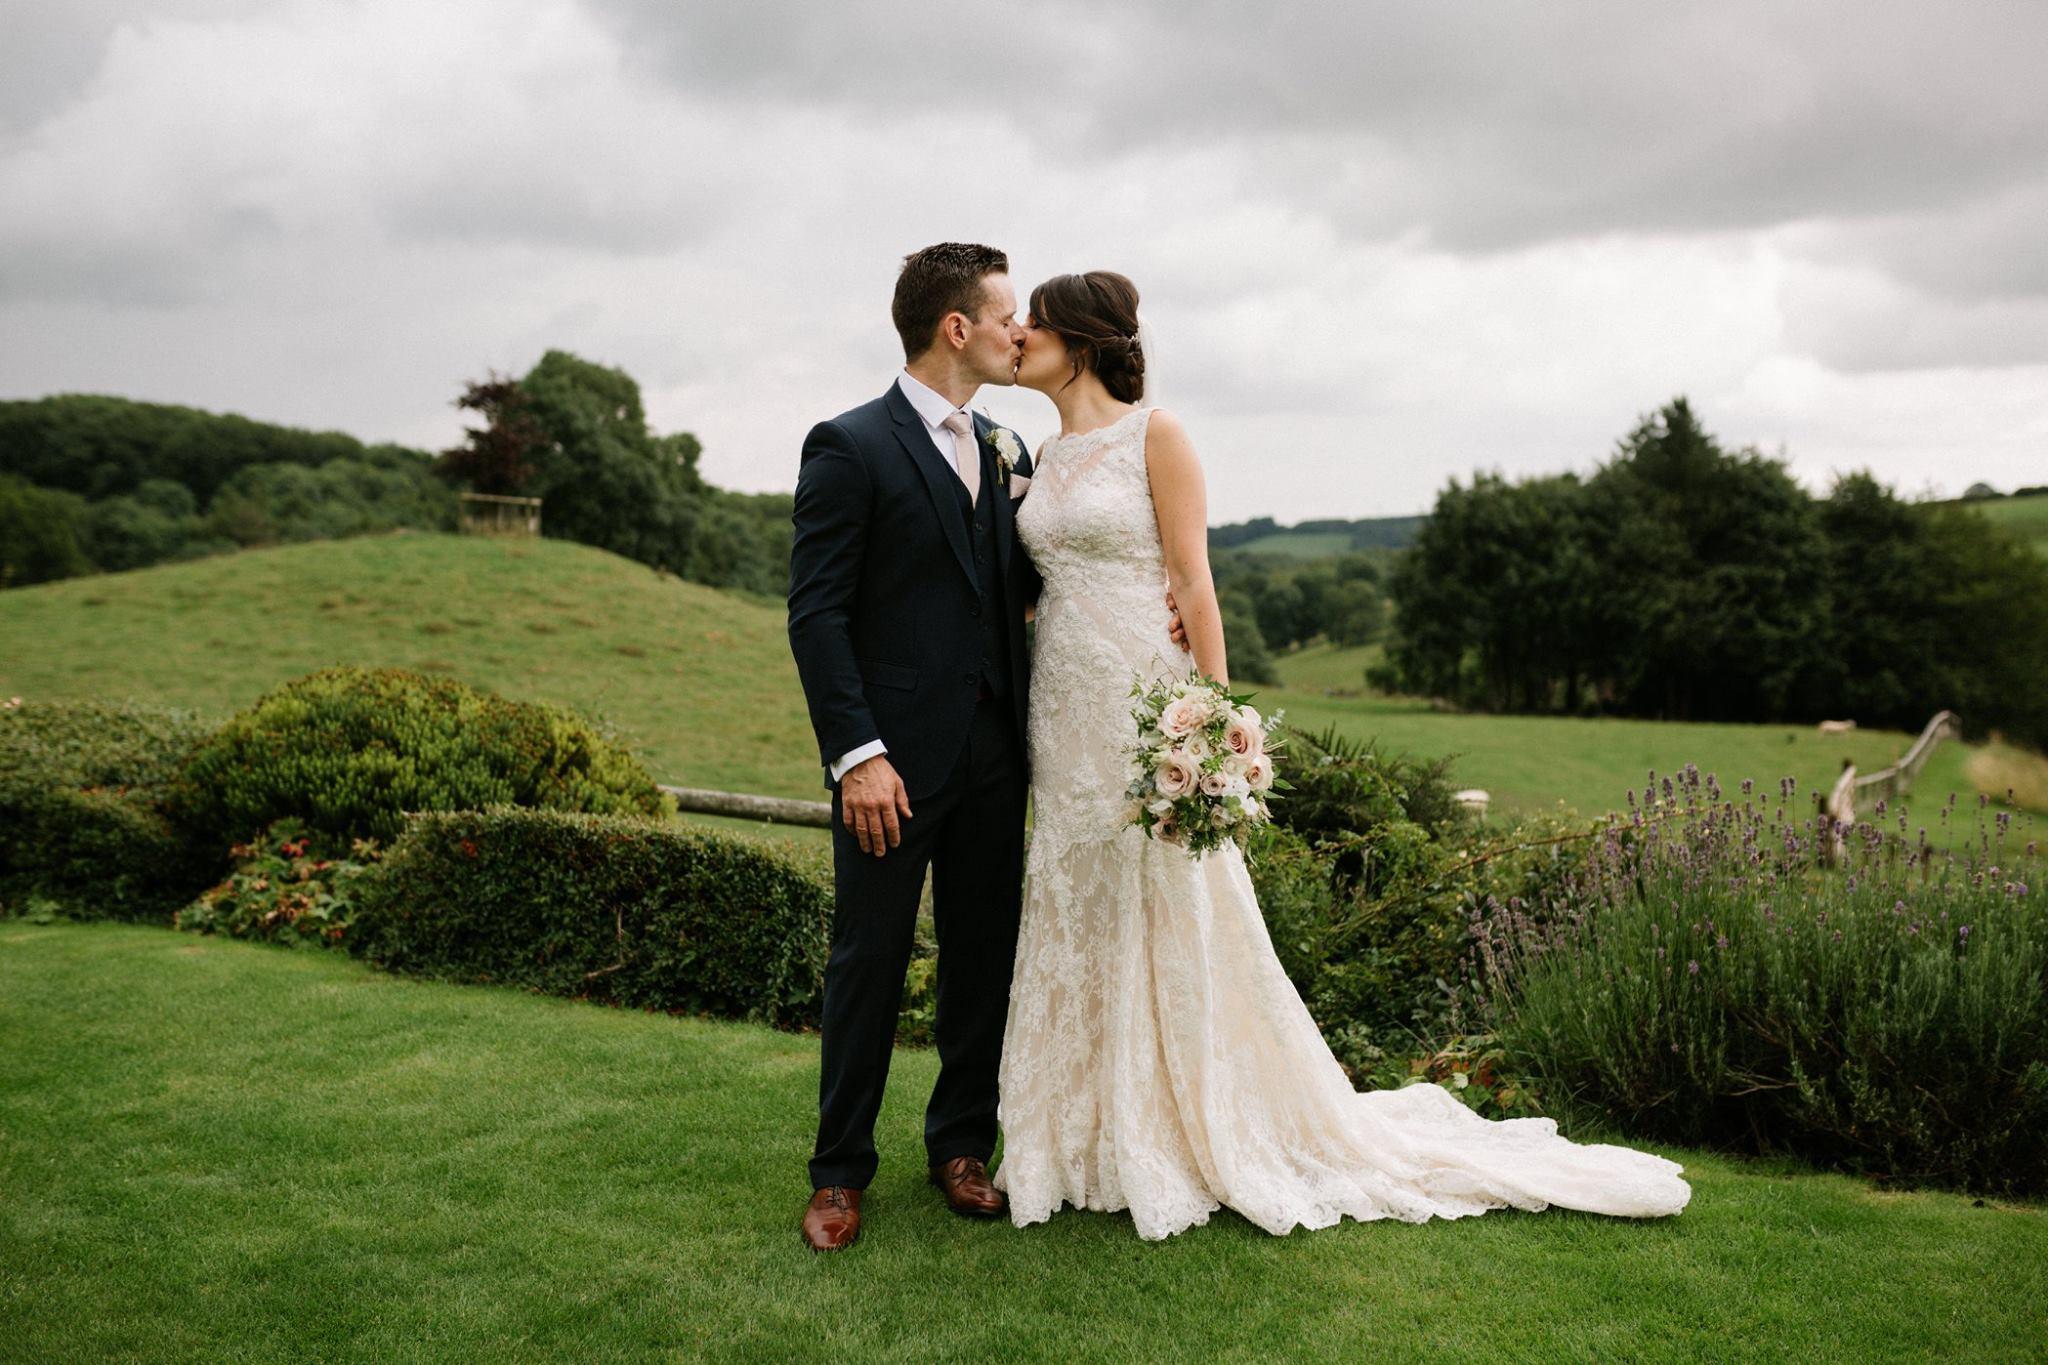 Kingscote Barn Wedding Suppliers